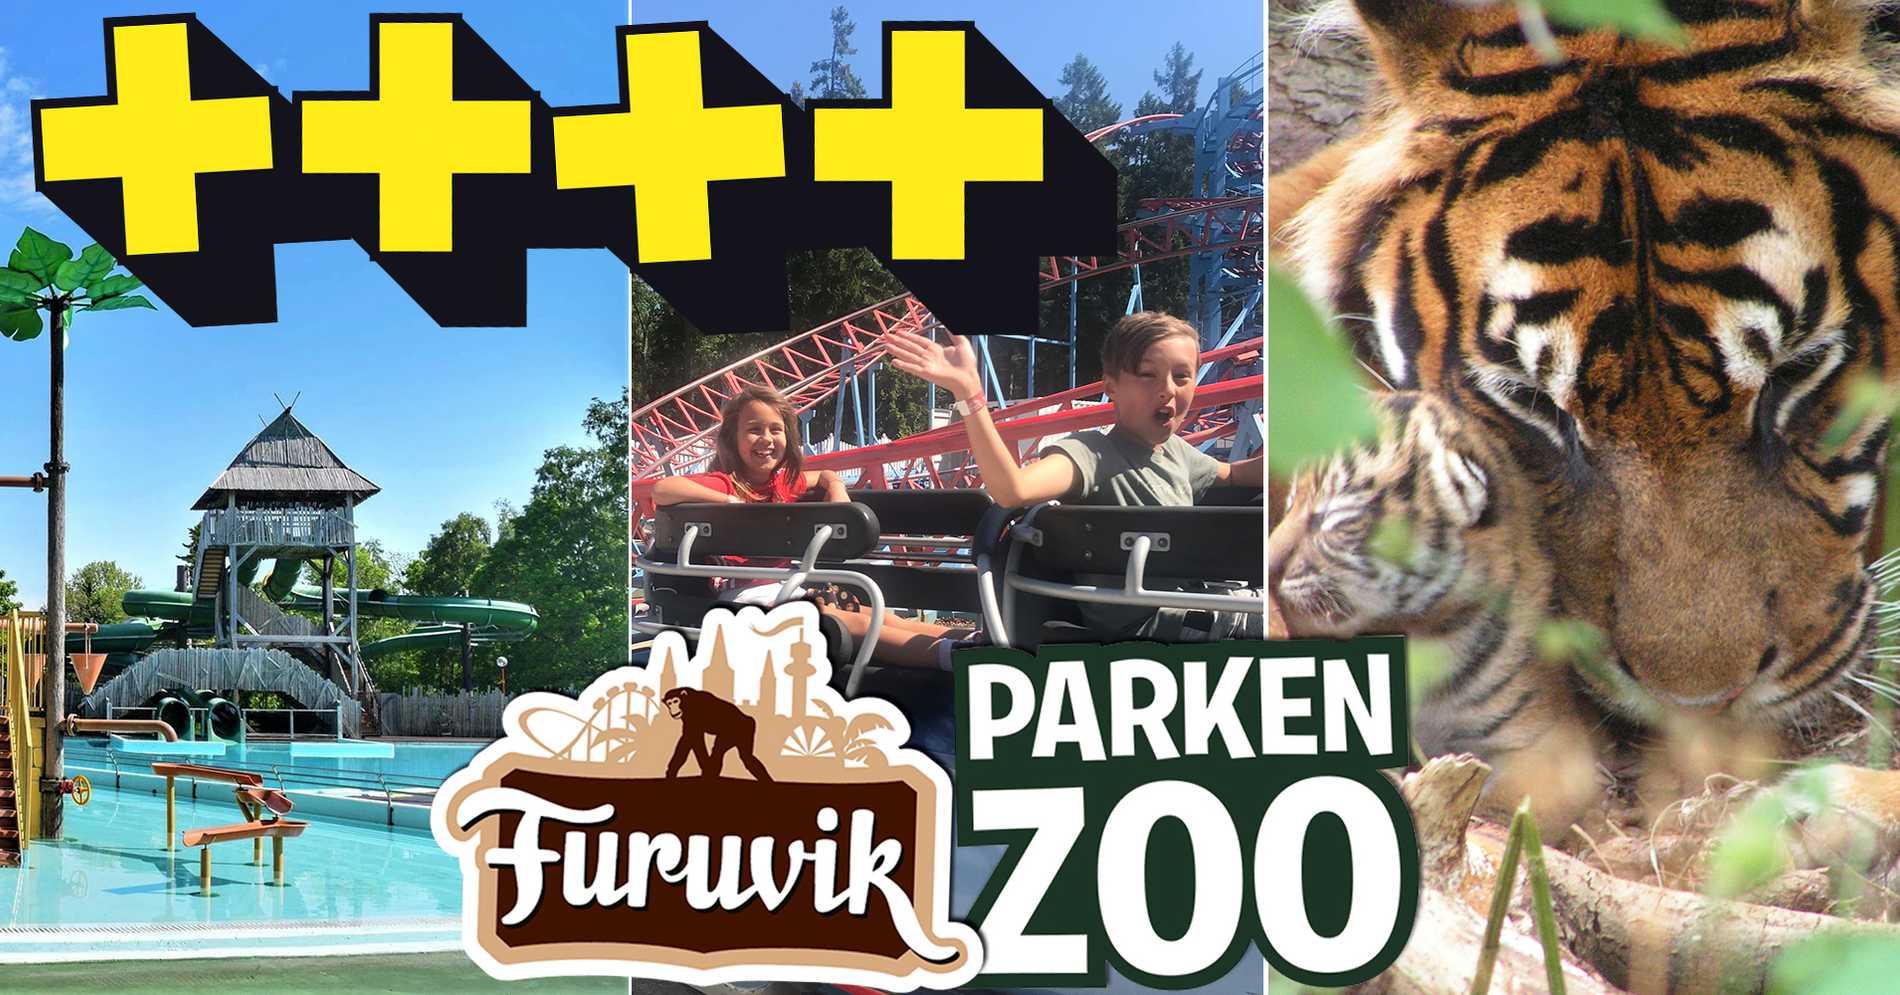 Furuvik vs. Parken Zoo – vilken nöjespark är bäst   3c9344e0291a4